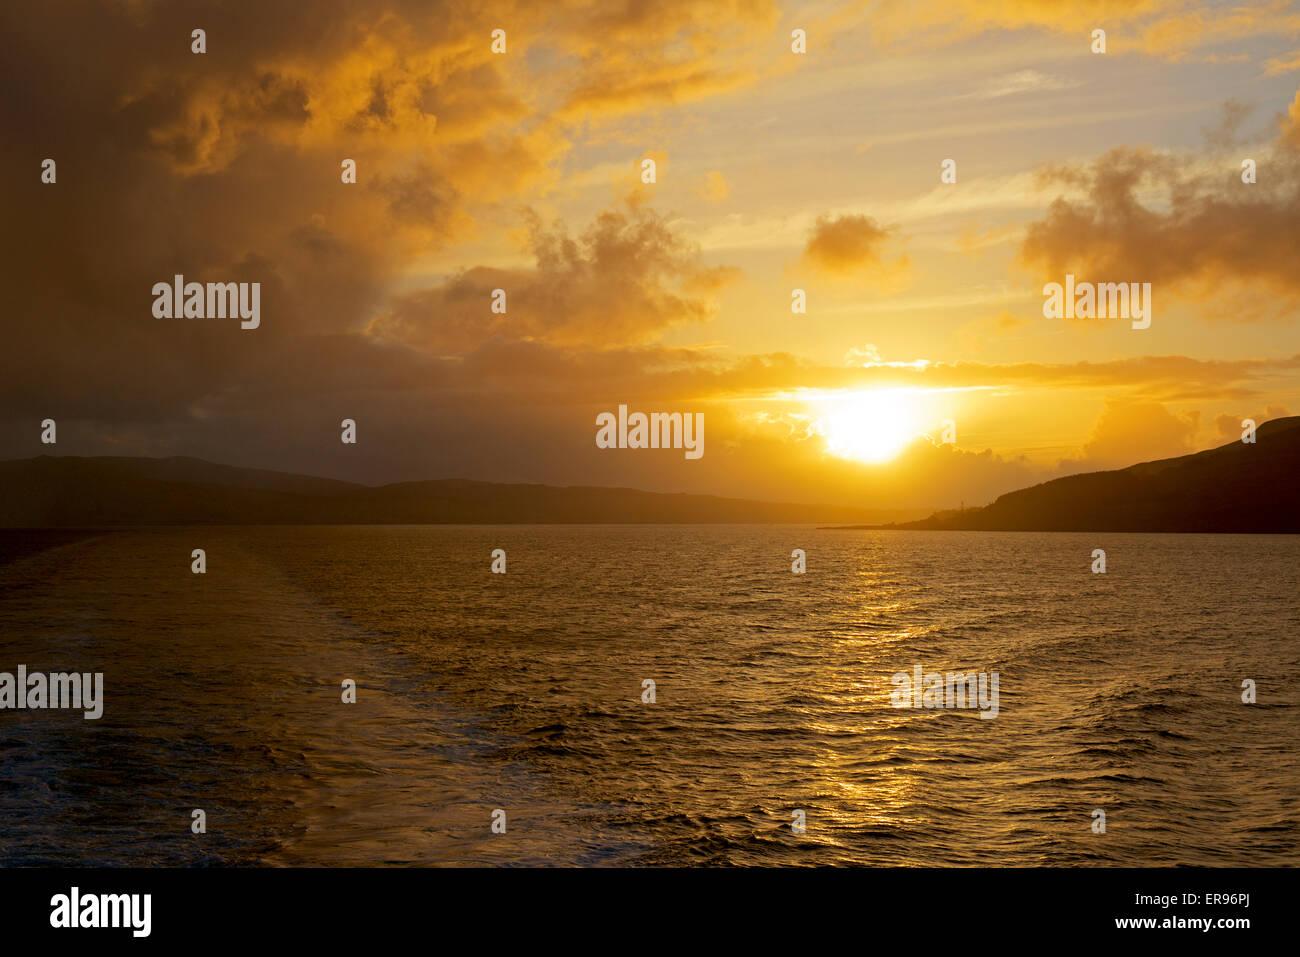 Sunset over the sea, Sound of Mull, Scotland UK - Stock Image